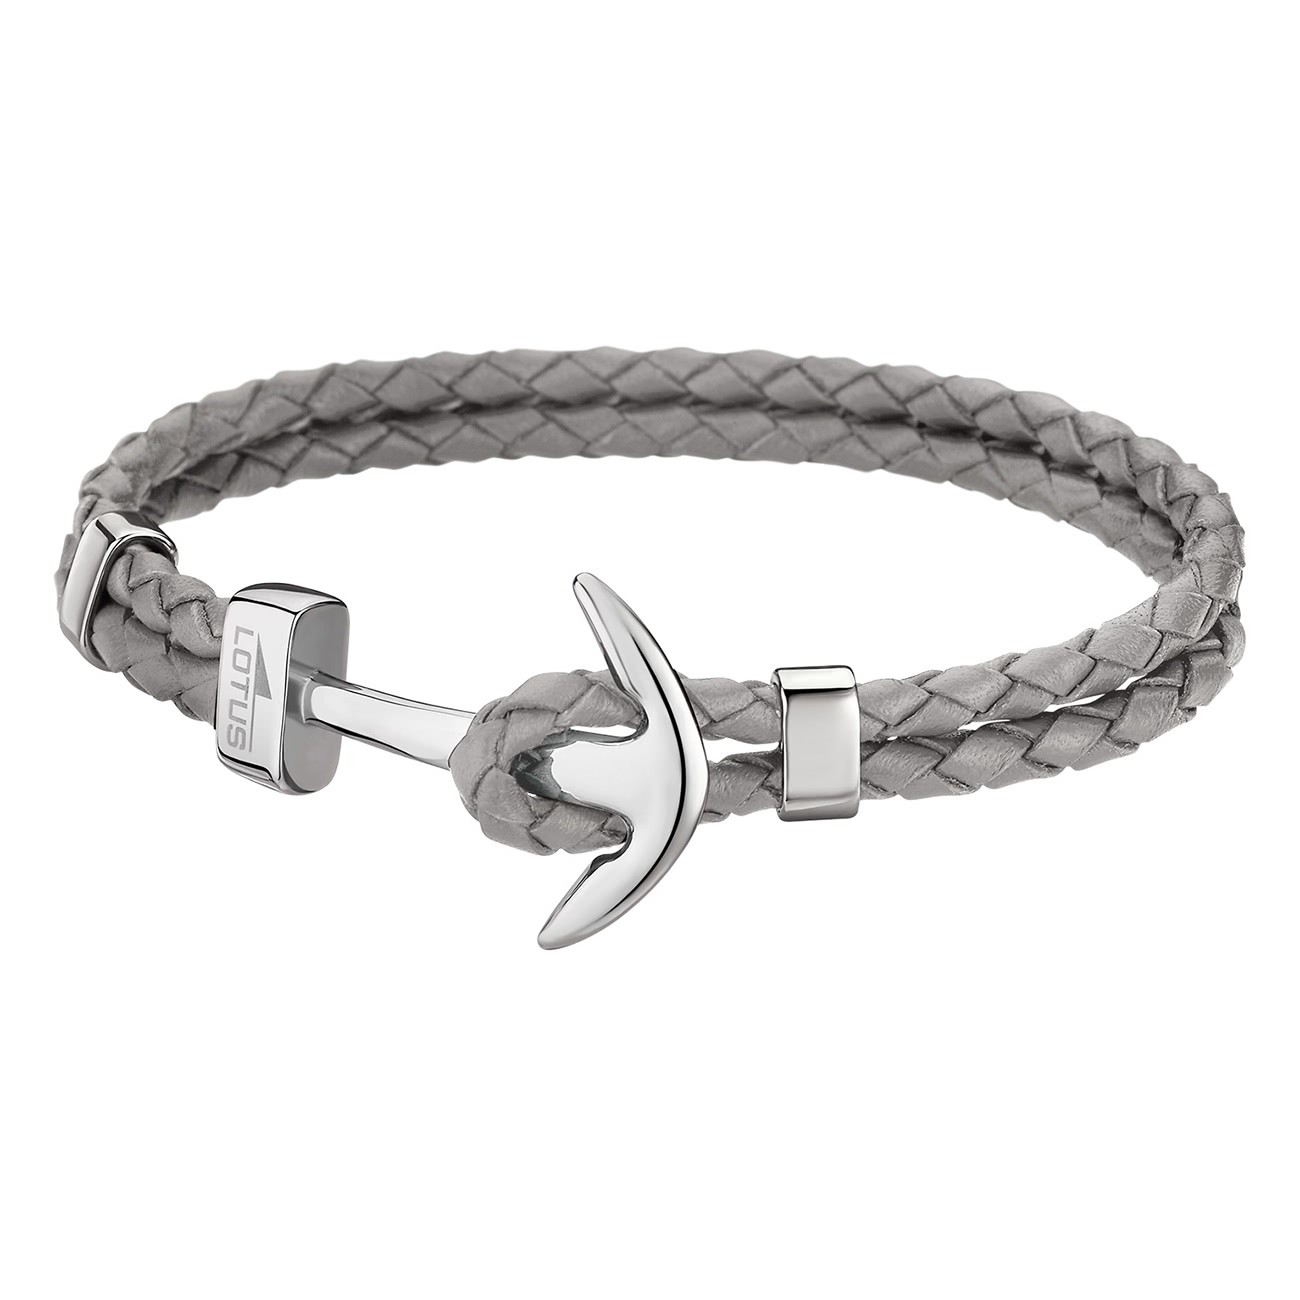 LOTUS Style Armband Herren Leder grau LS1832-2/3 Anker Schmuck JLS1832-2-3